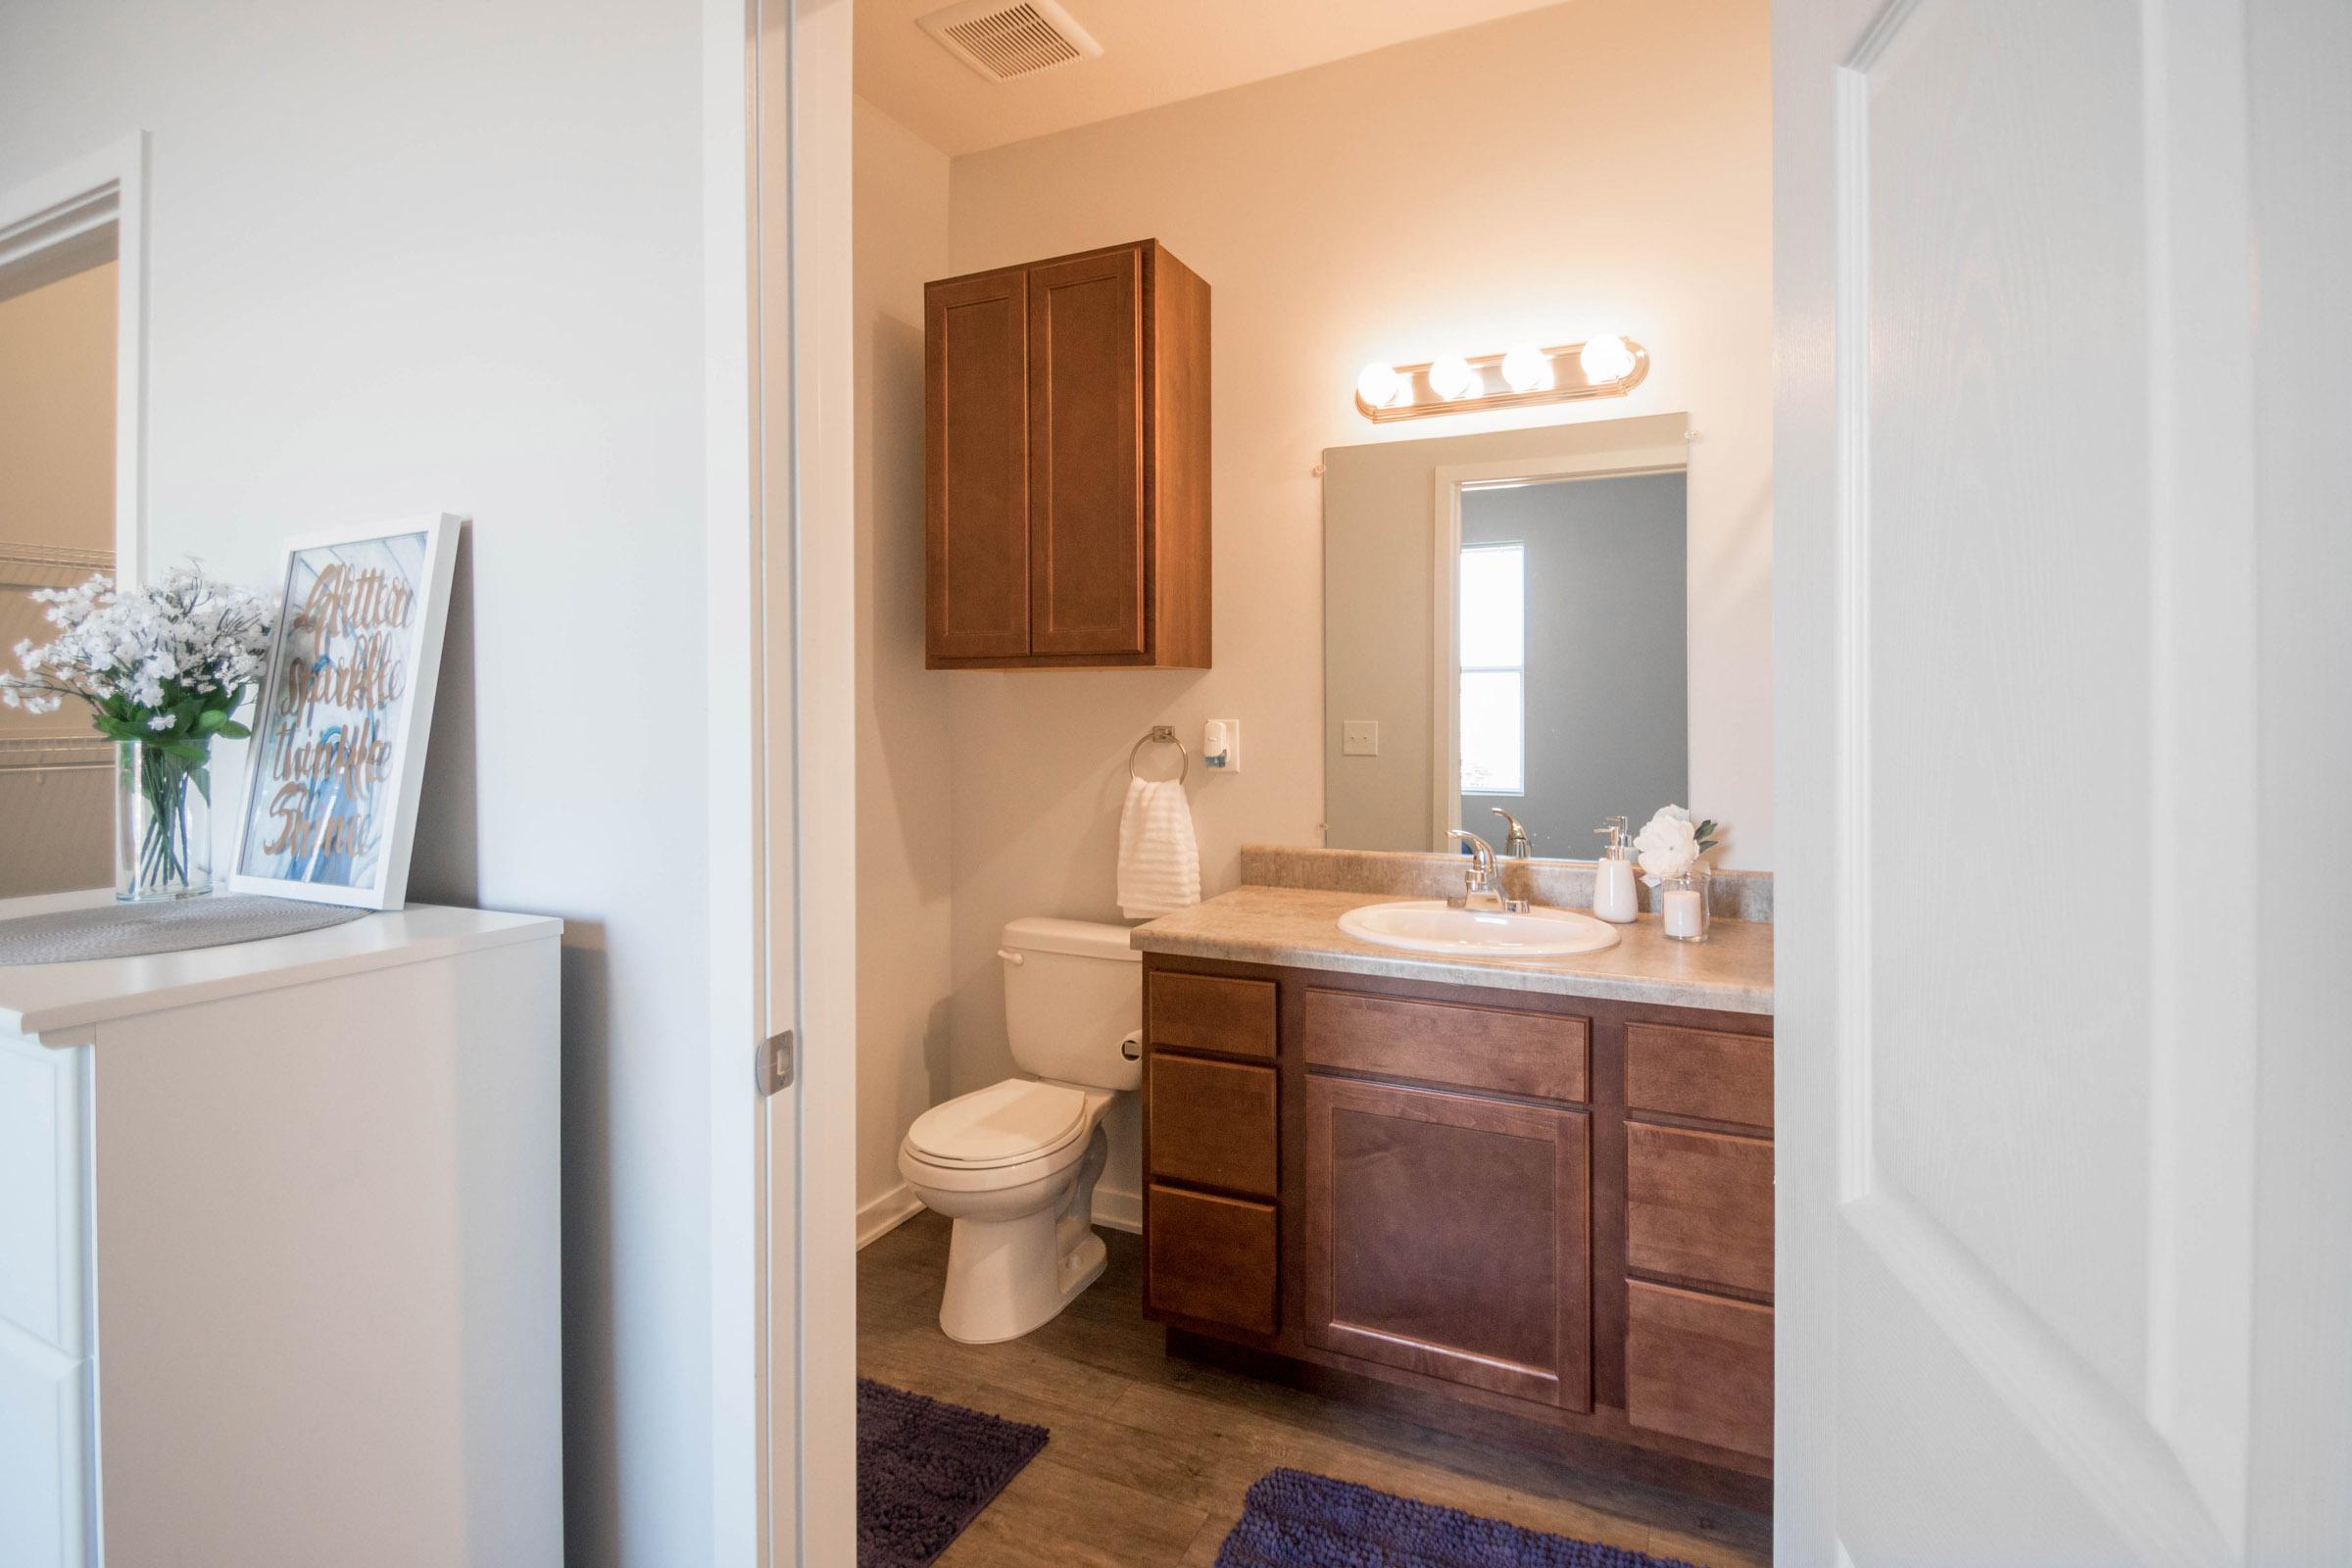 Bathroom at Aspen Grove Apartments in Omaha, NE